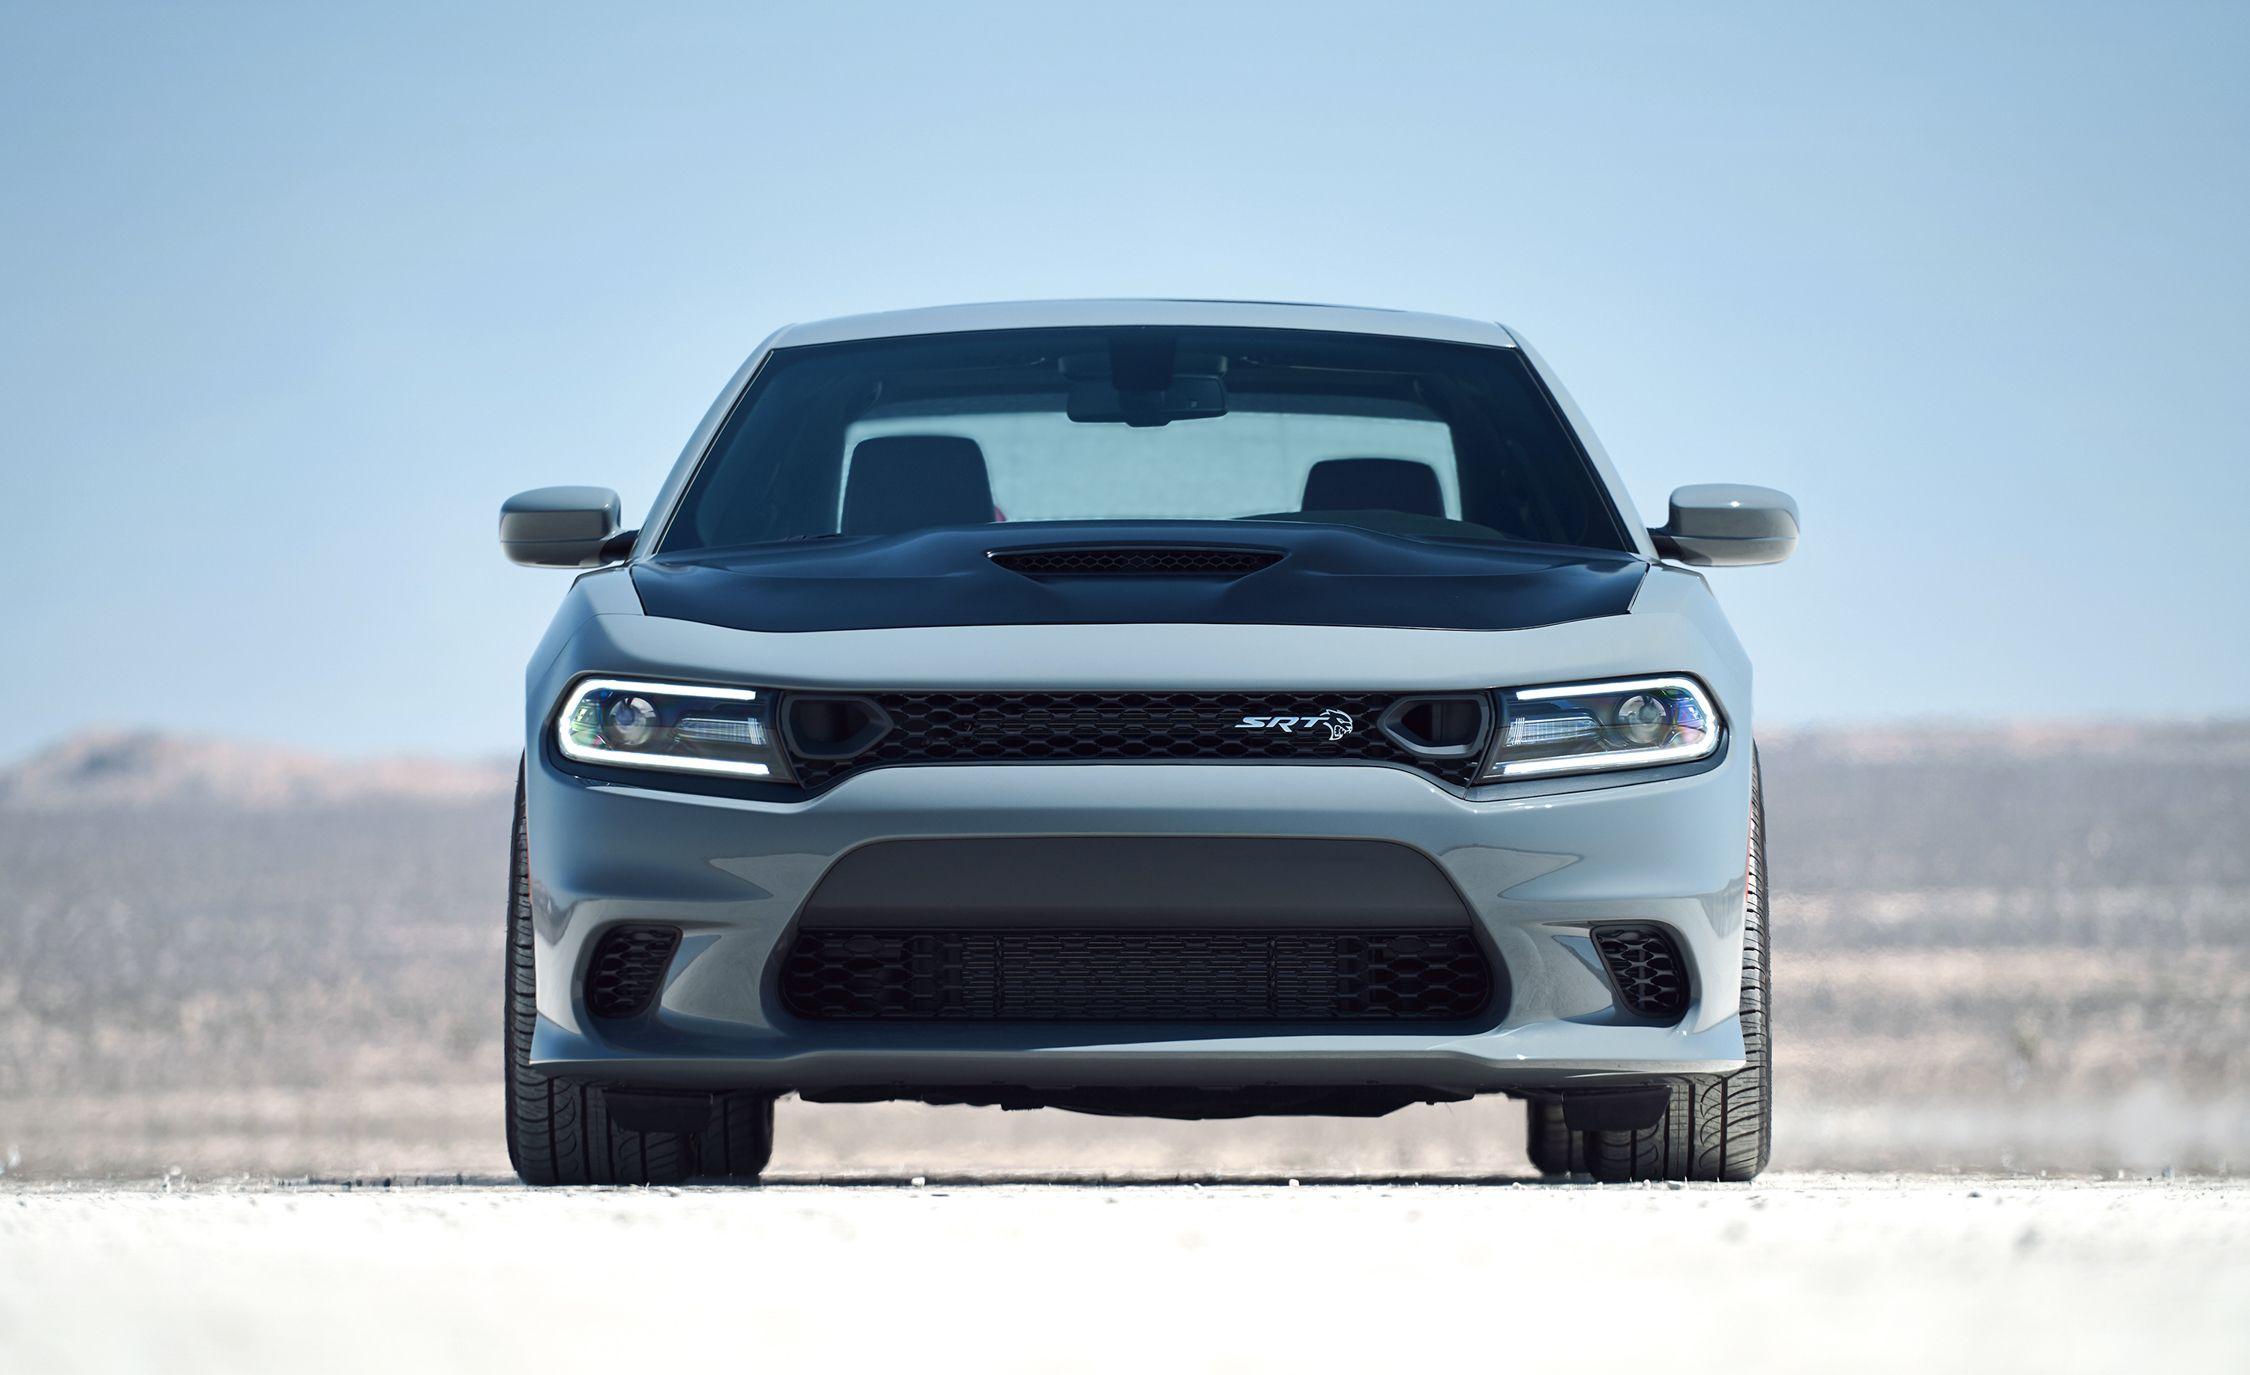 2019 Dodge Charger SRT / SRT Hellcat Reviews   Dodge Charger SRT / SRT  Hellcat Price, Photos, and Specs   Car and Driver